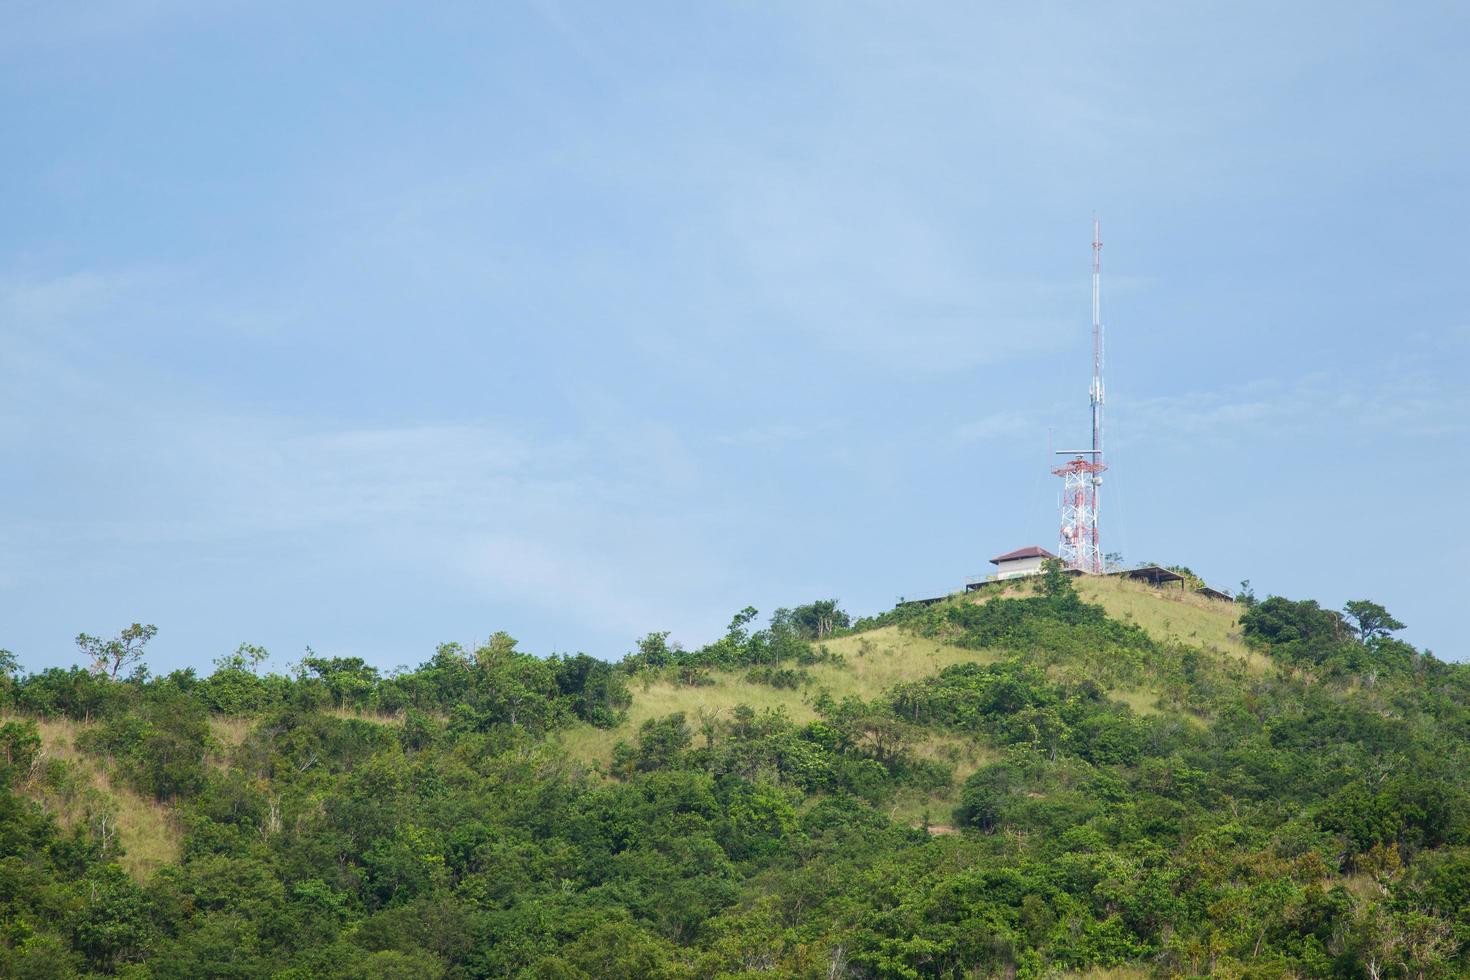 antena de telecomunicaciones en la colina foto